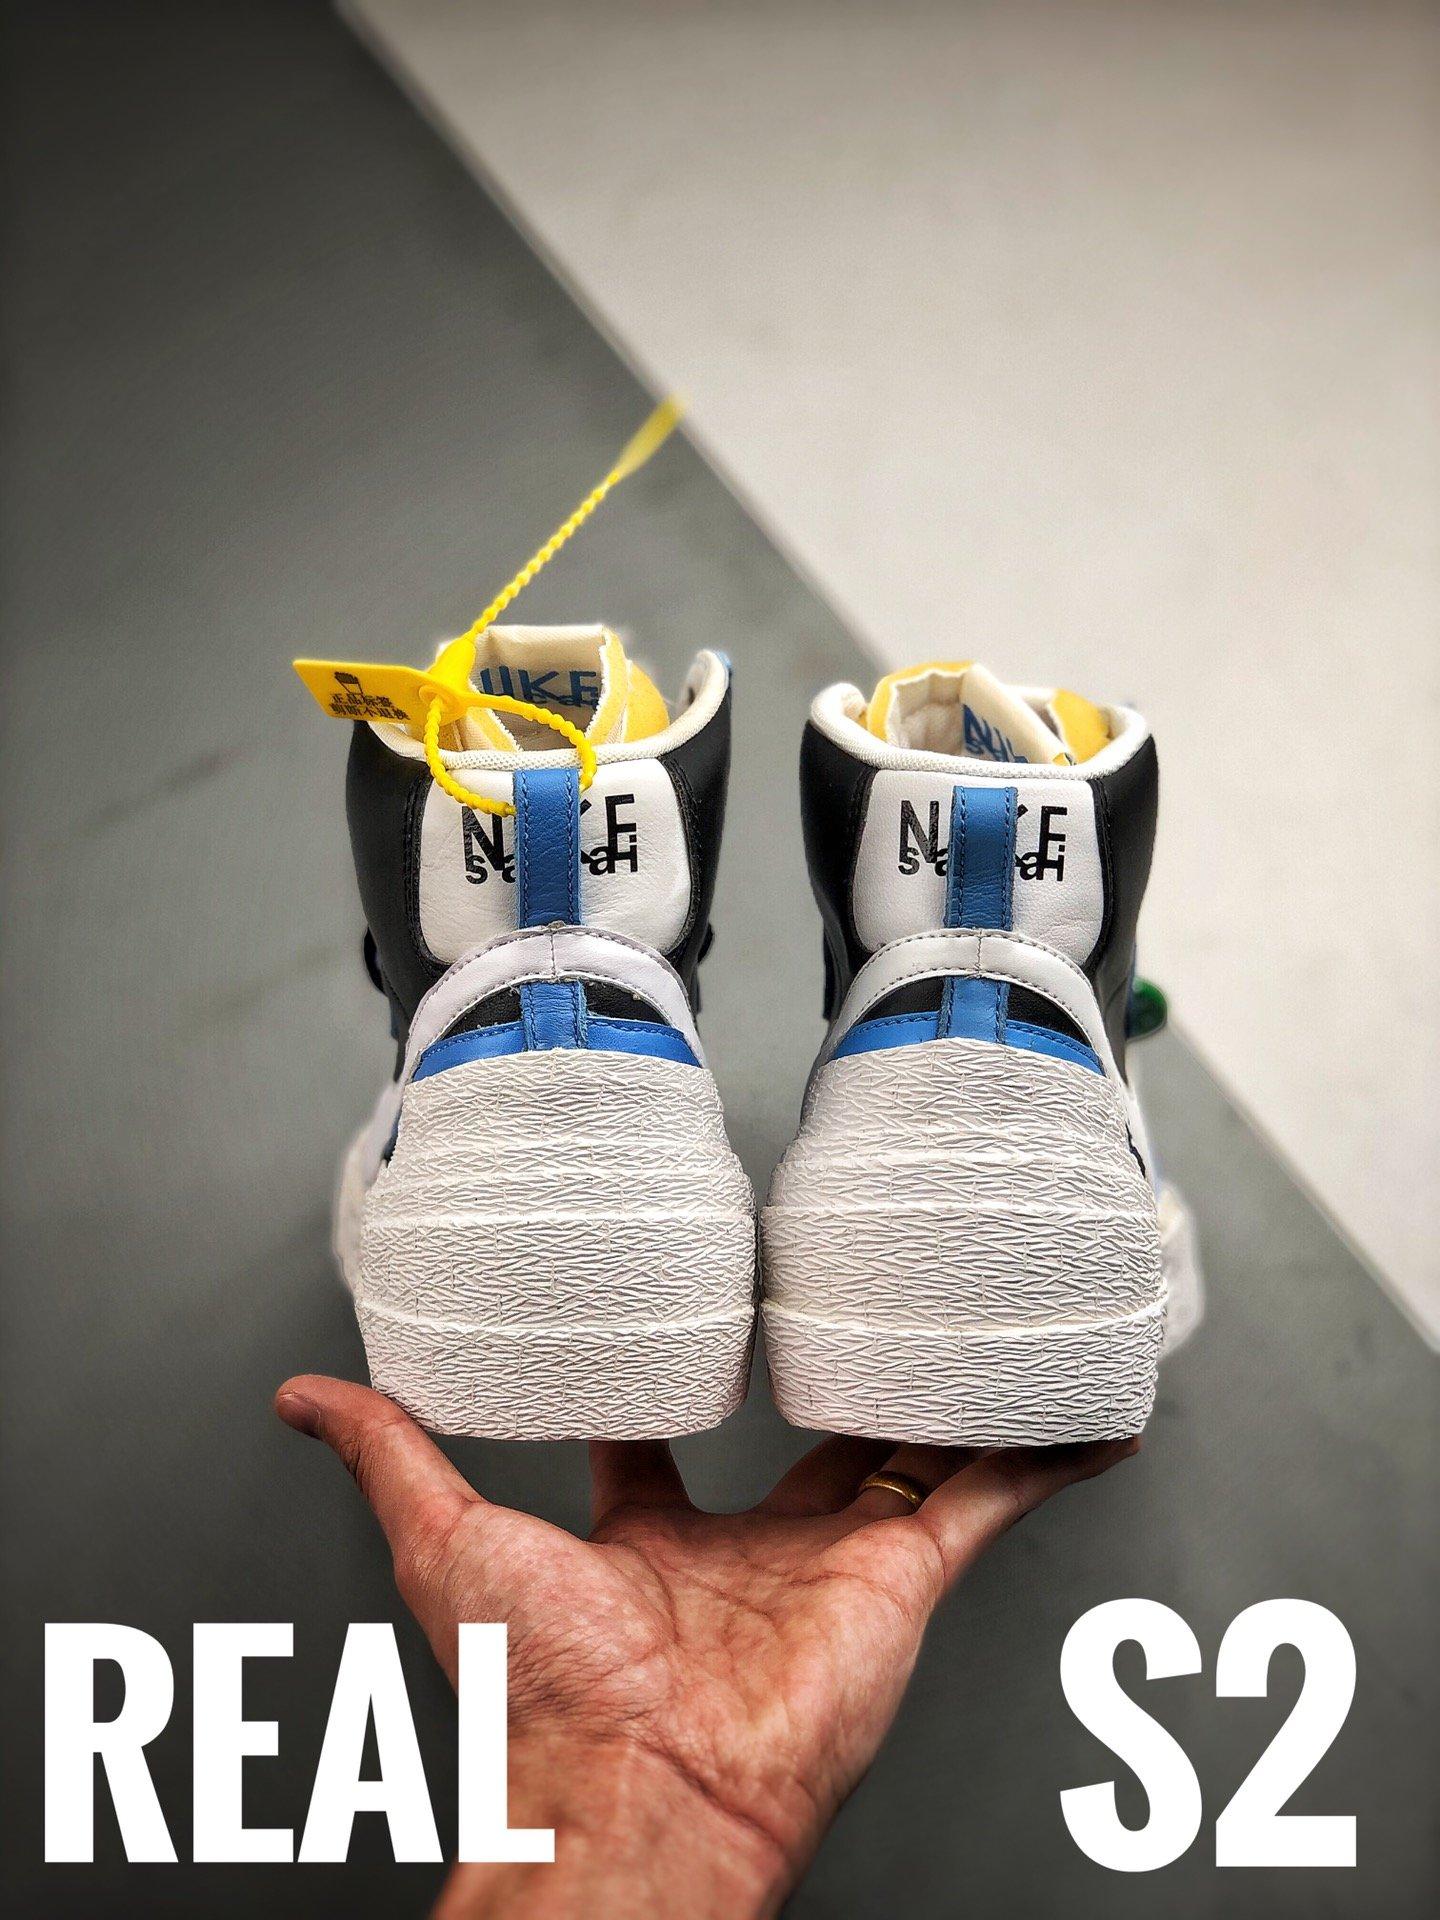 S2纯原Blazer对比原装 渠道裸鞋级直观分析